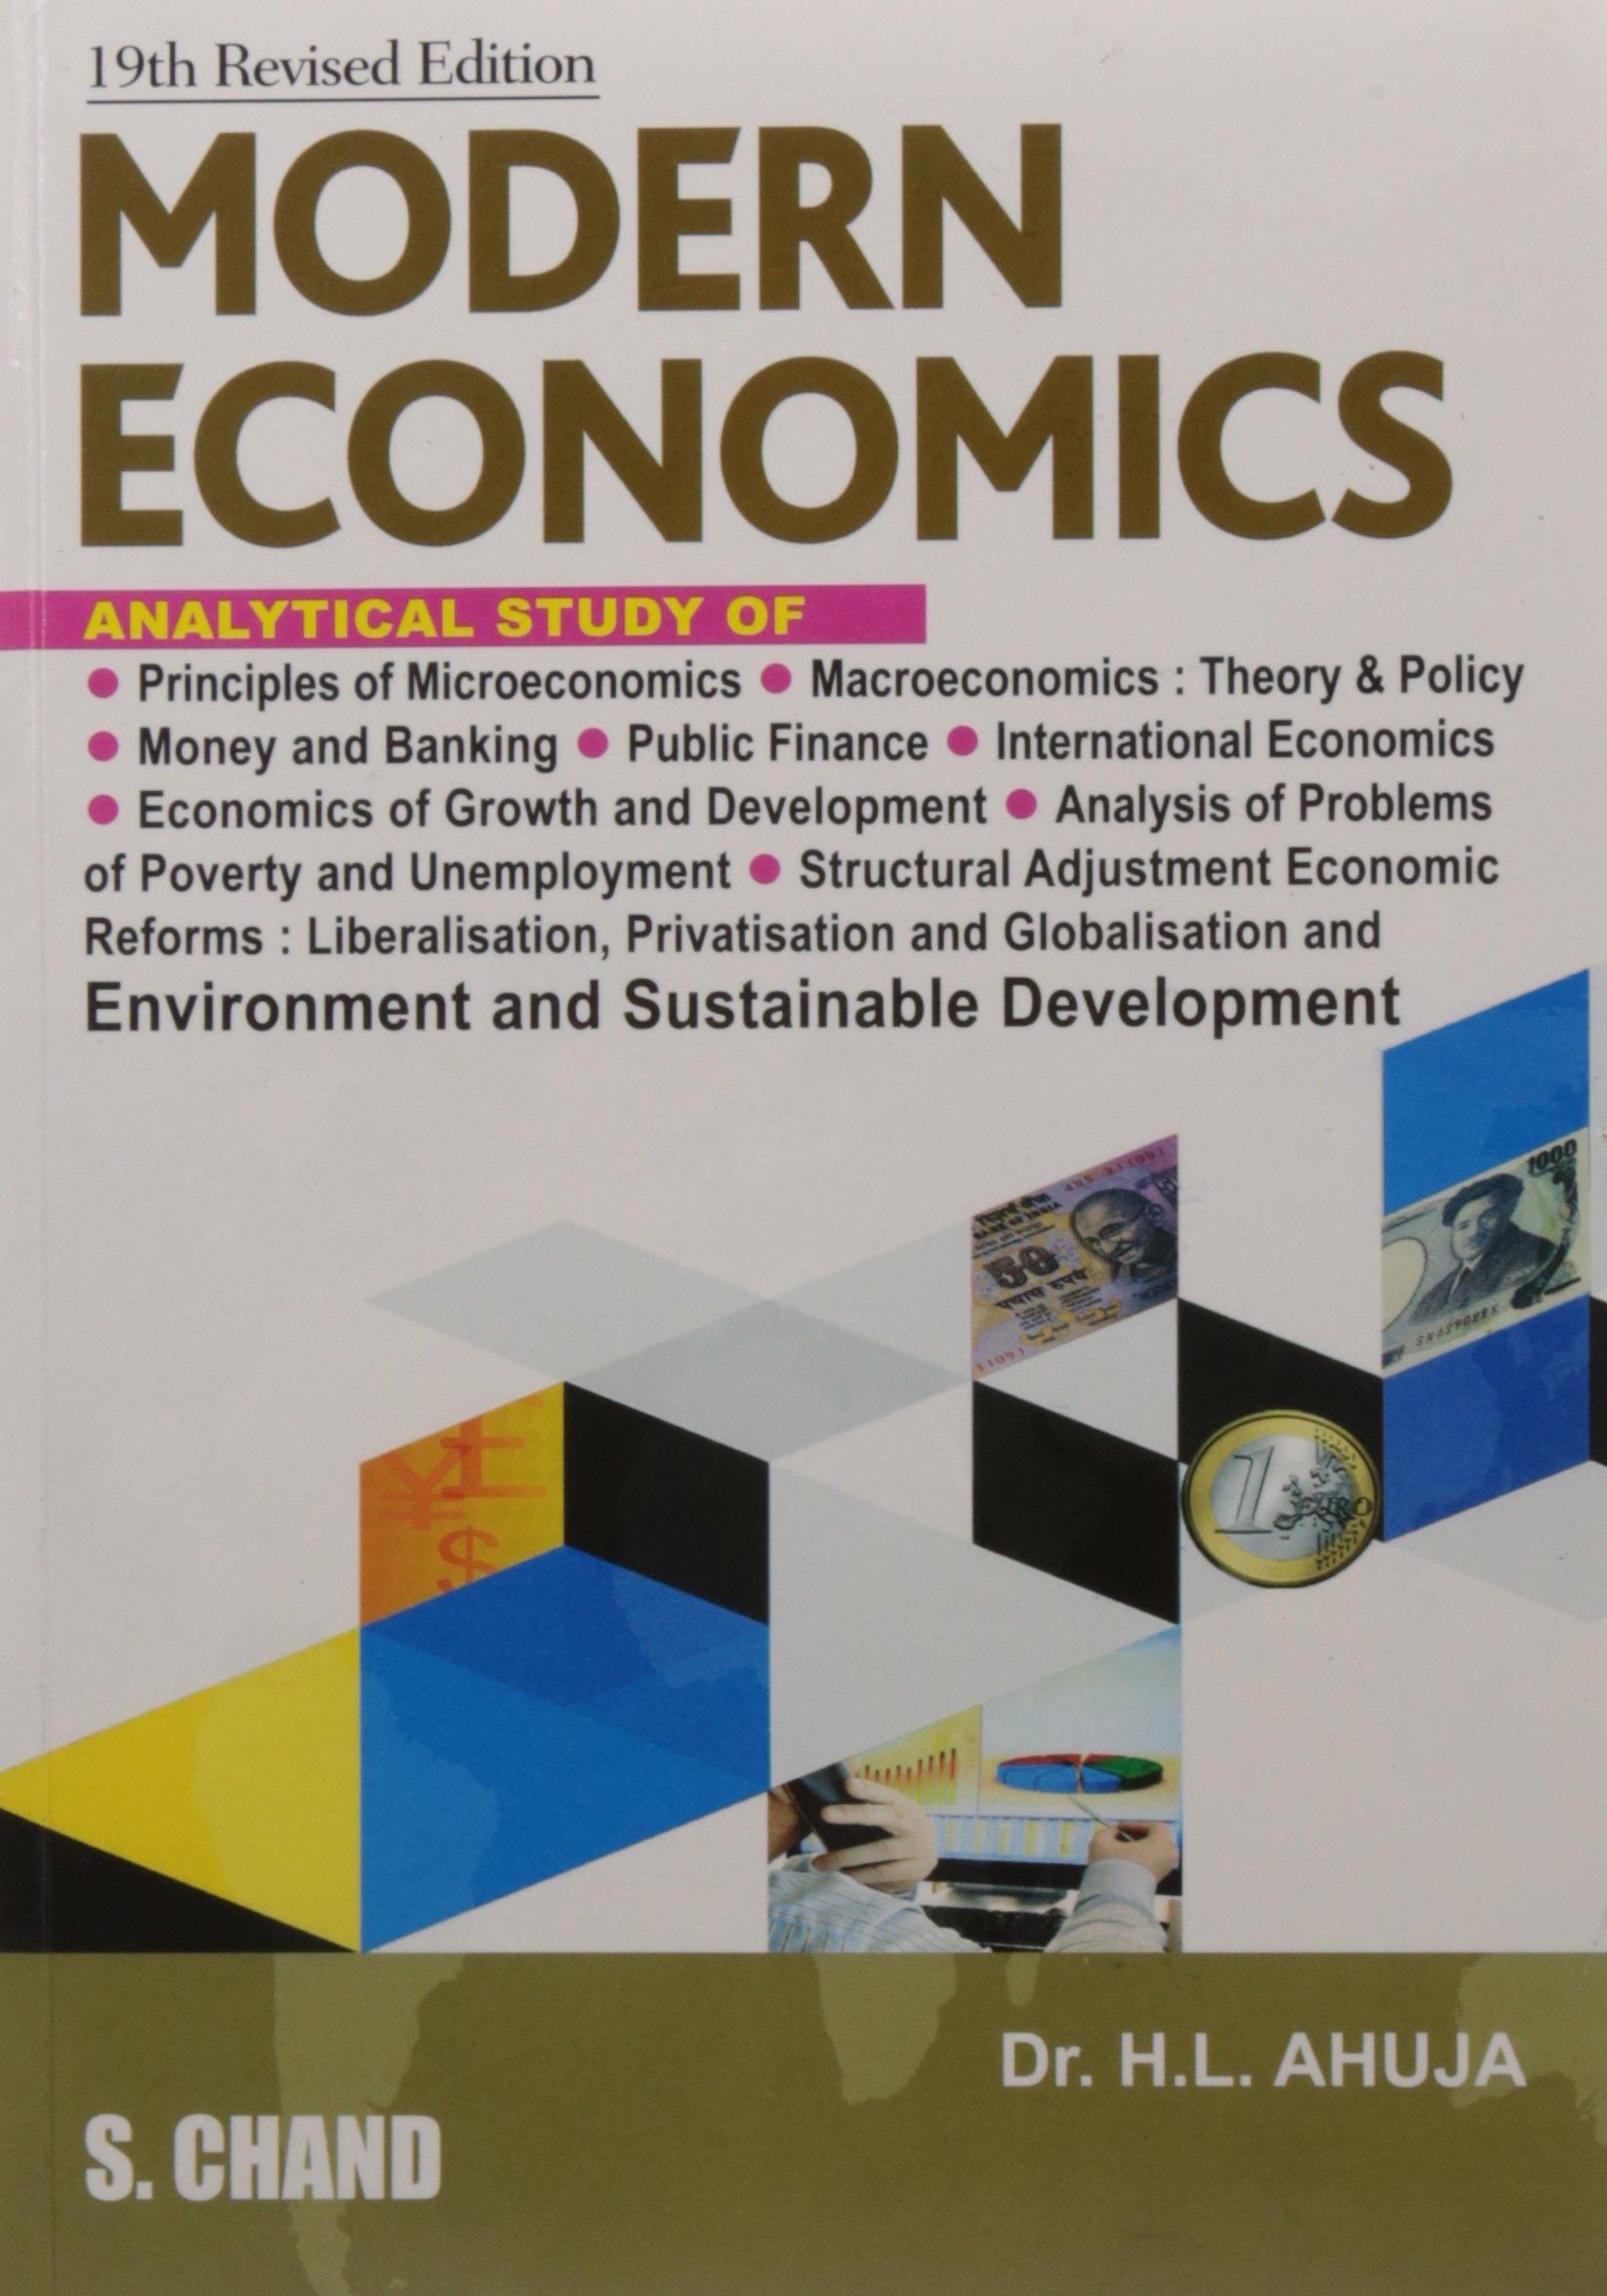 hl ahuja macroeconomics free download